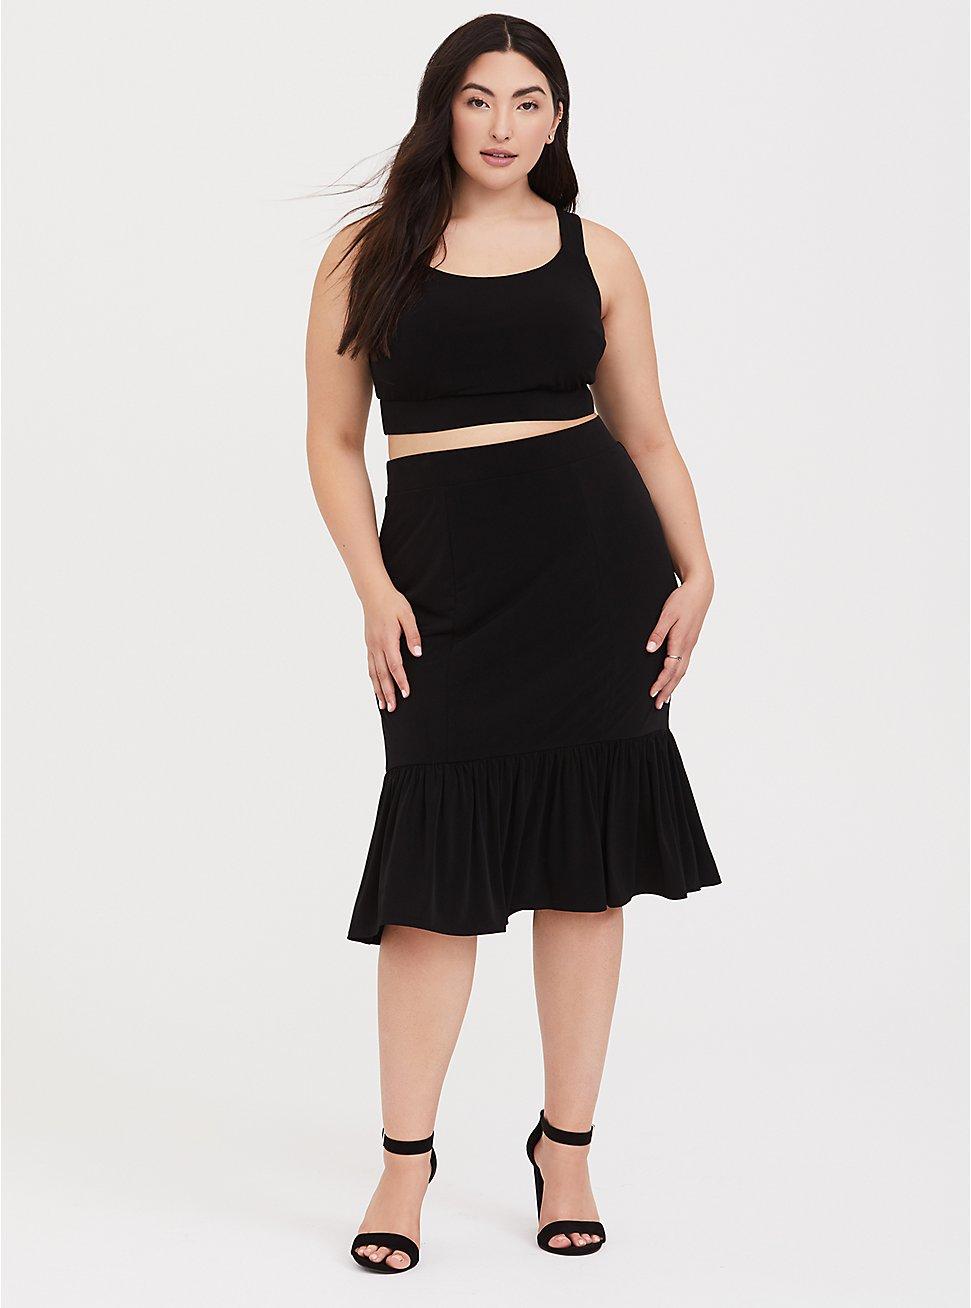 Black Studio Knit Mermaid Midi Skirt & Crop Top Set, DEEP BLACK, hi-res